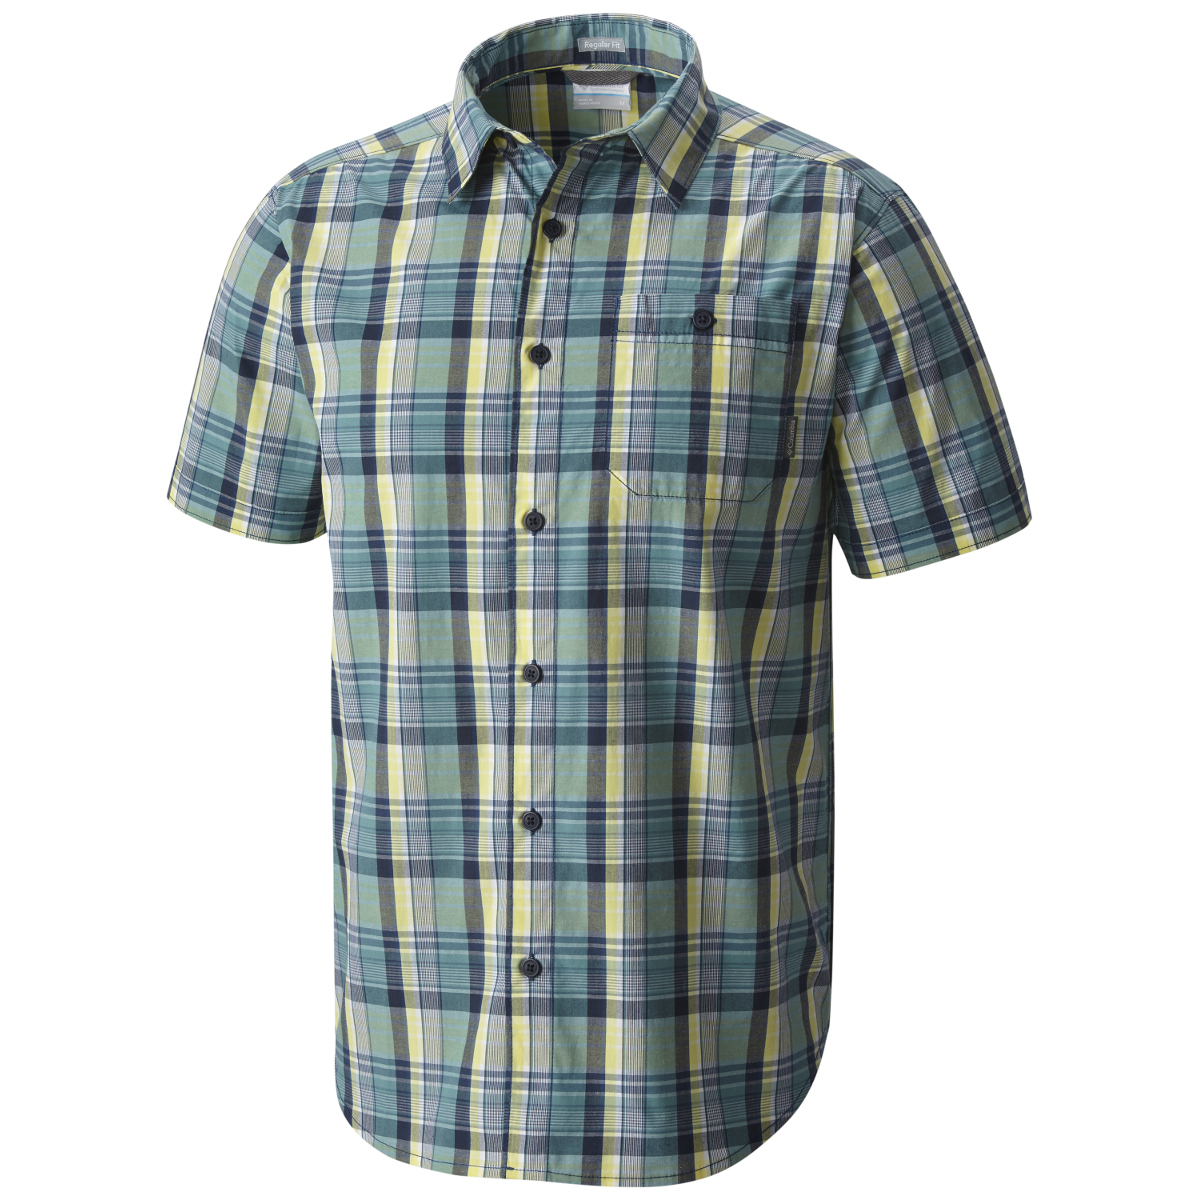 Columbia Men's Boulder Ridge Short-Sleeve Shirt - Black, XL